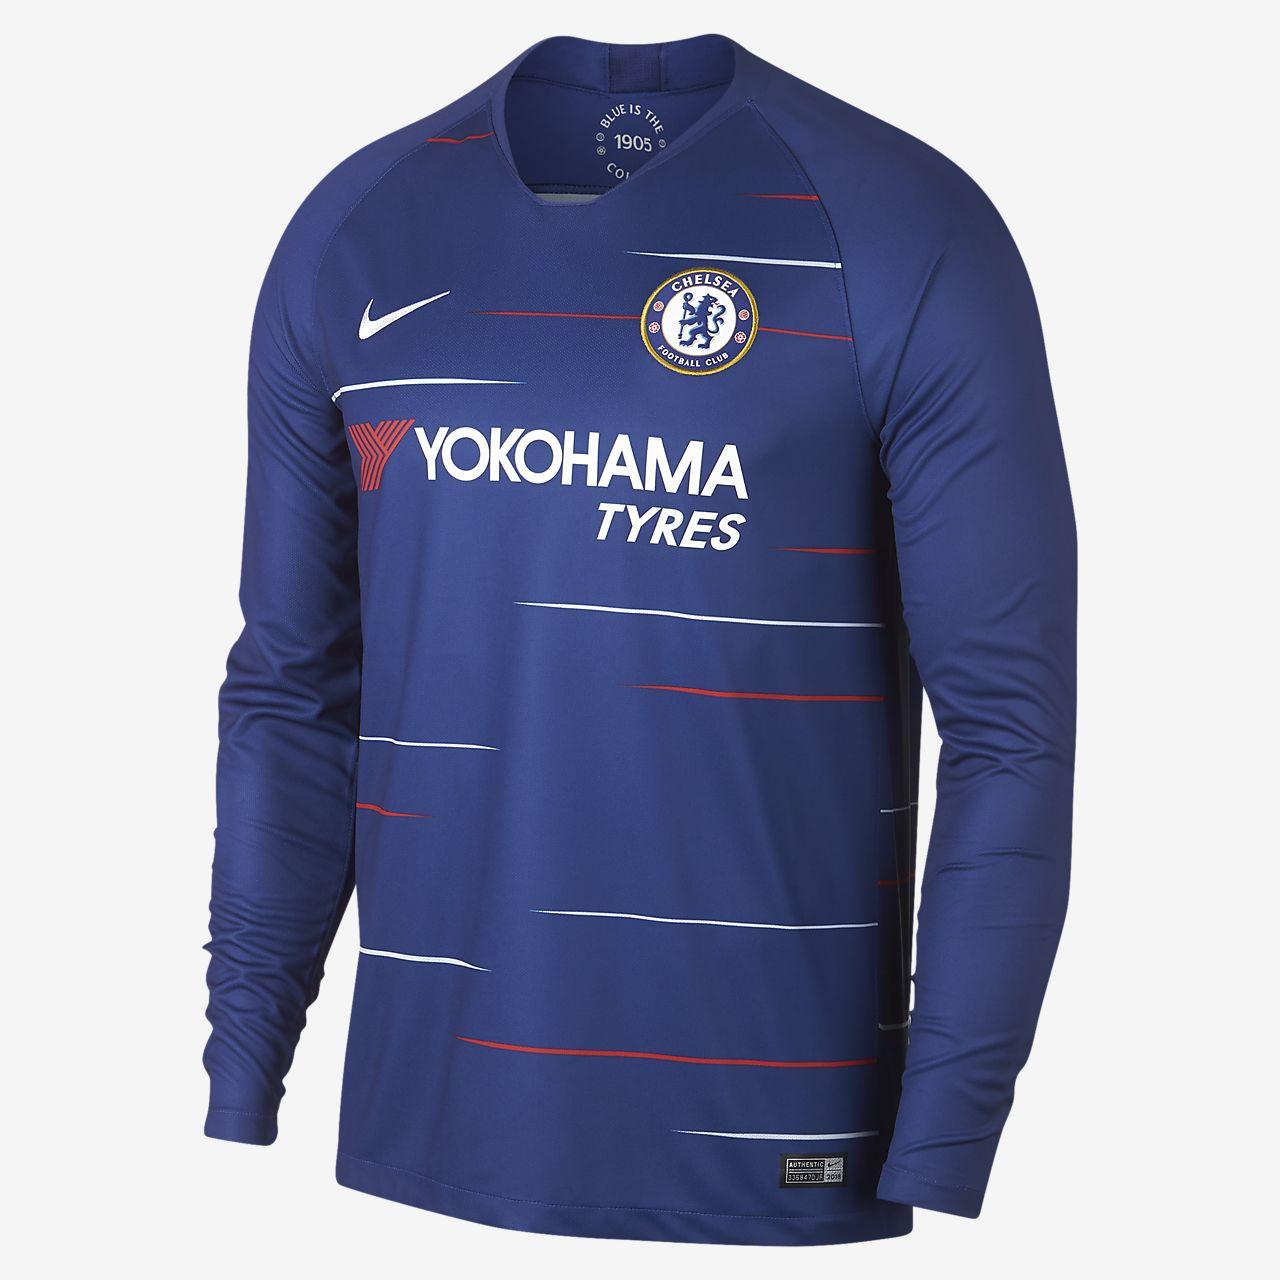 Camiseta de fútbol de manga larga para hombre de local Stadium del Chelsea  FC 2018  725165a02ad0e